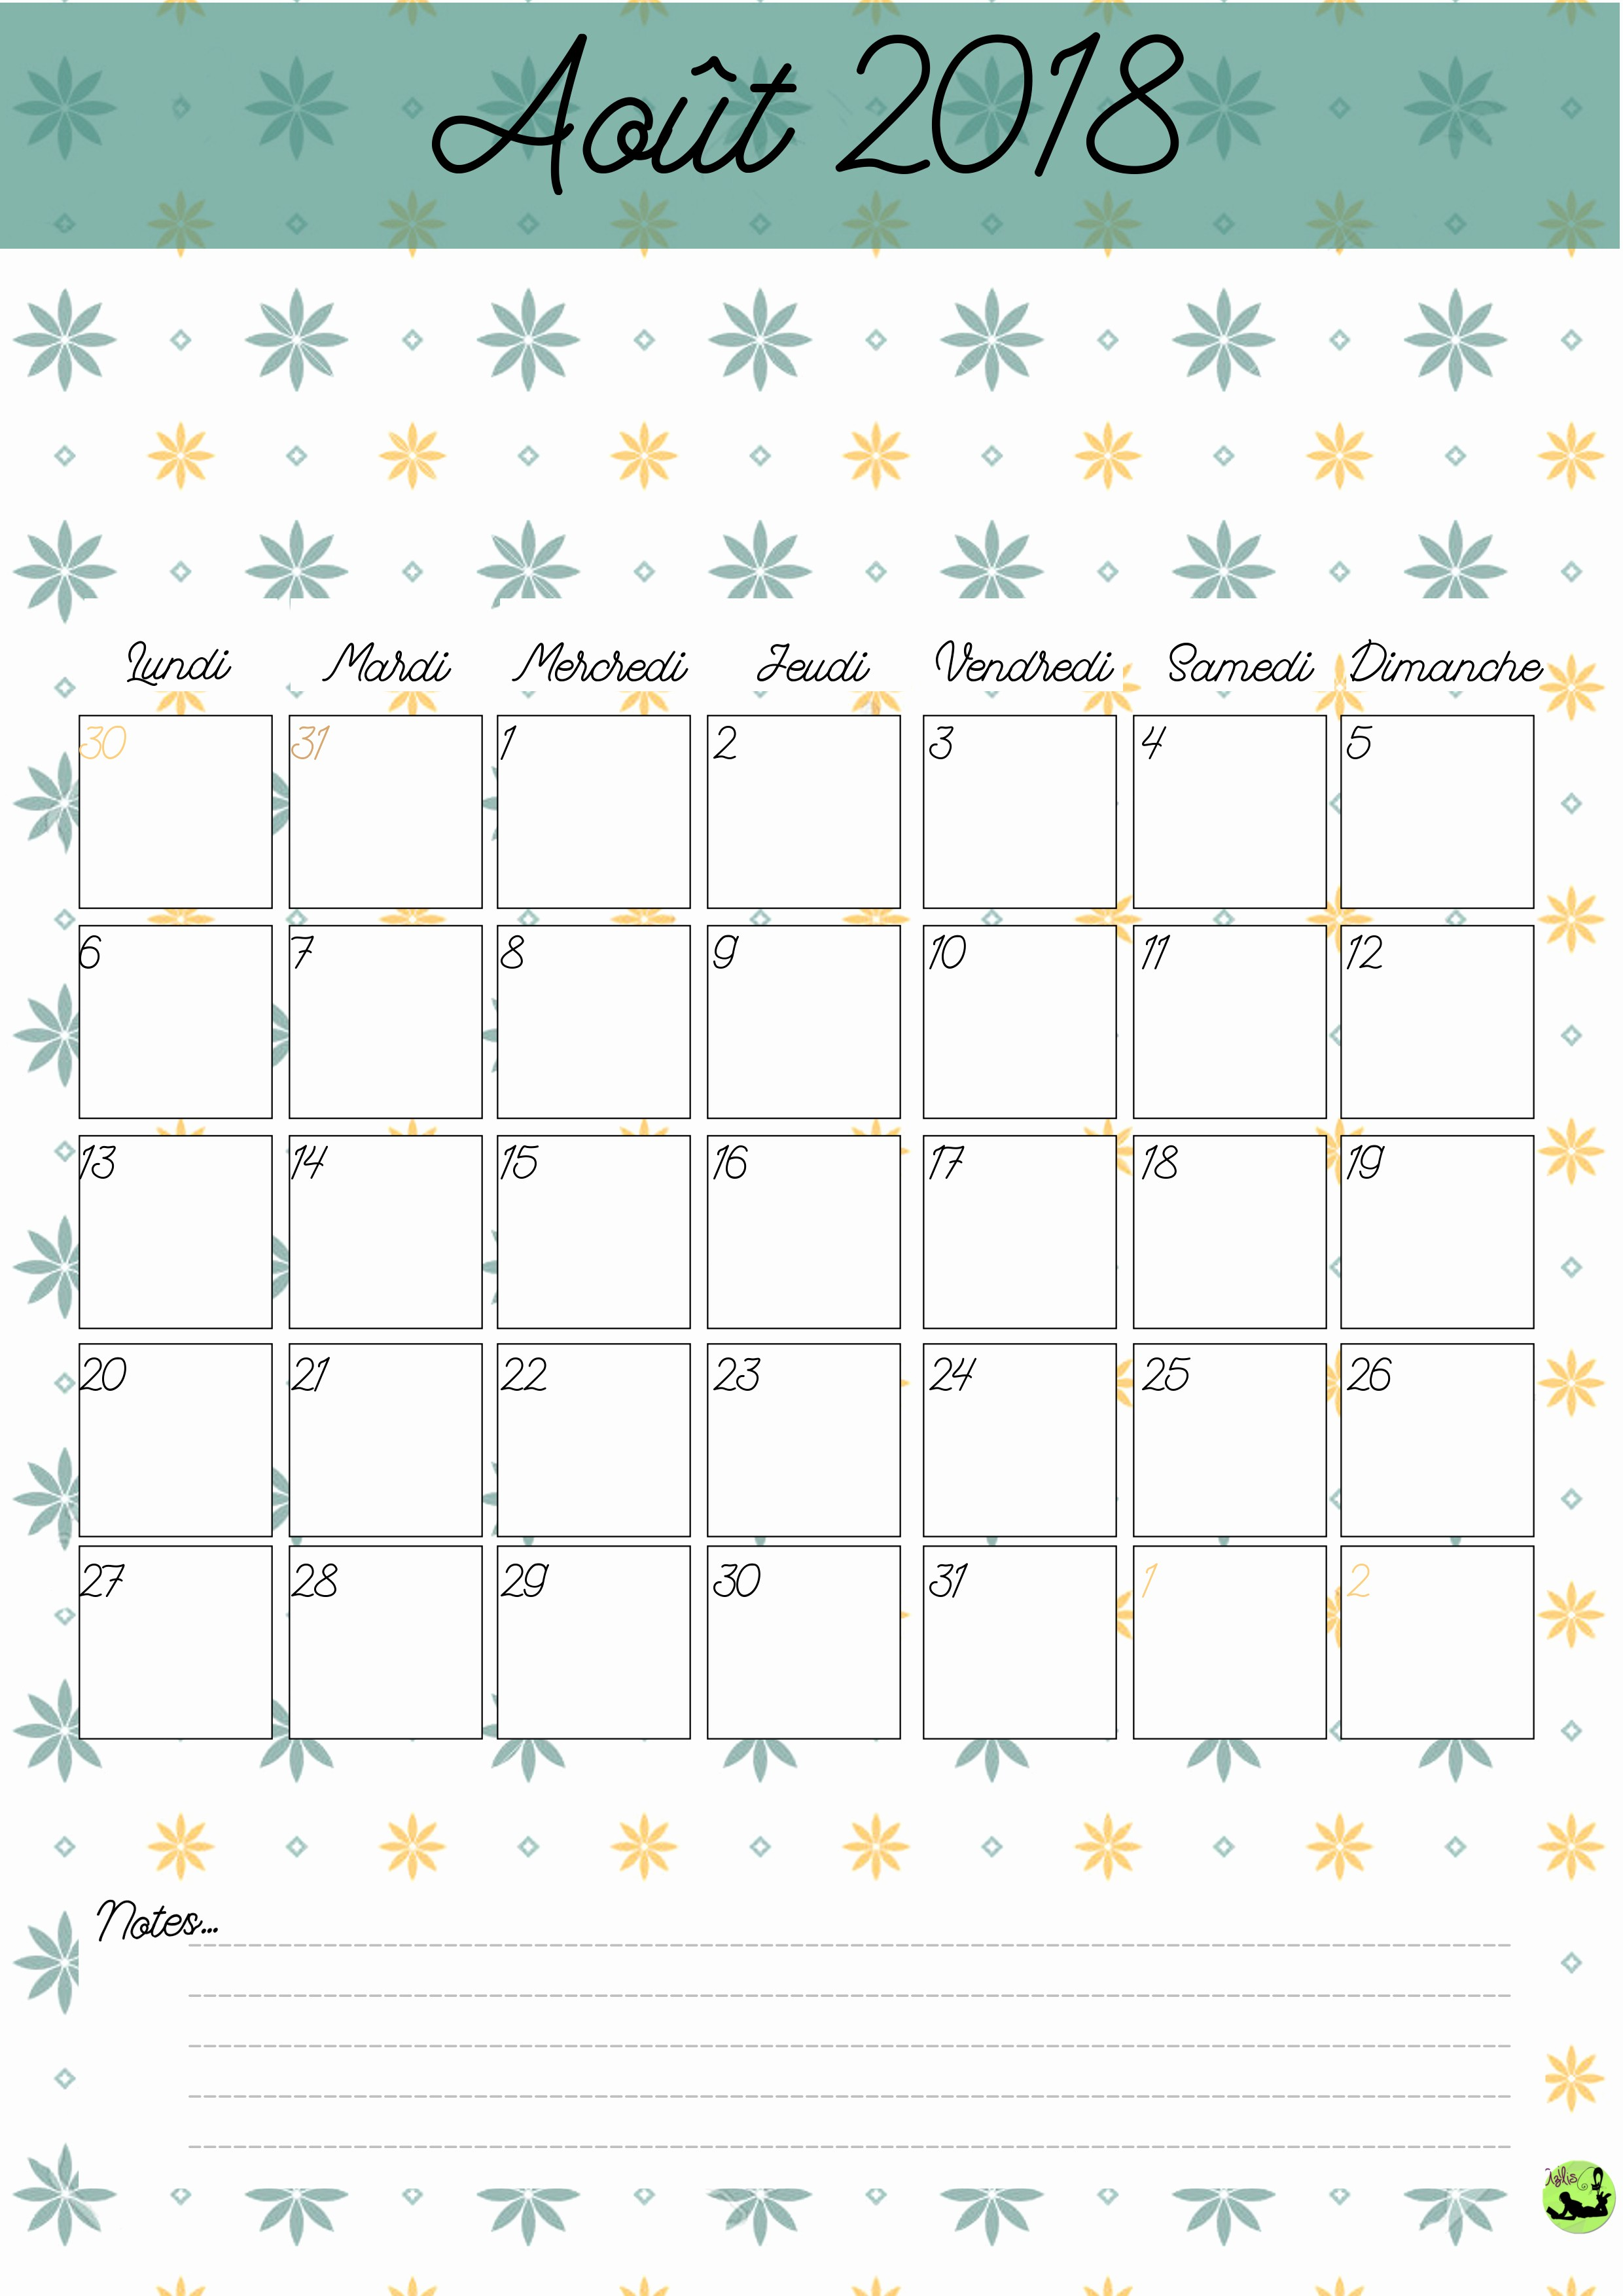 Du Calendar Calendrier 2017 2018 Gratuit A Imprimer